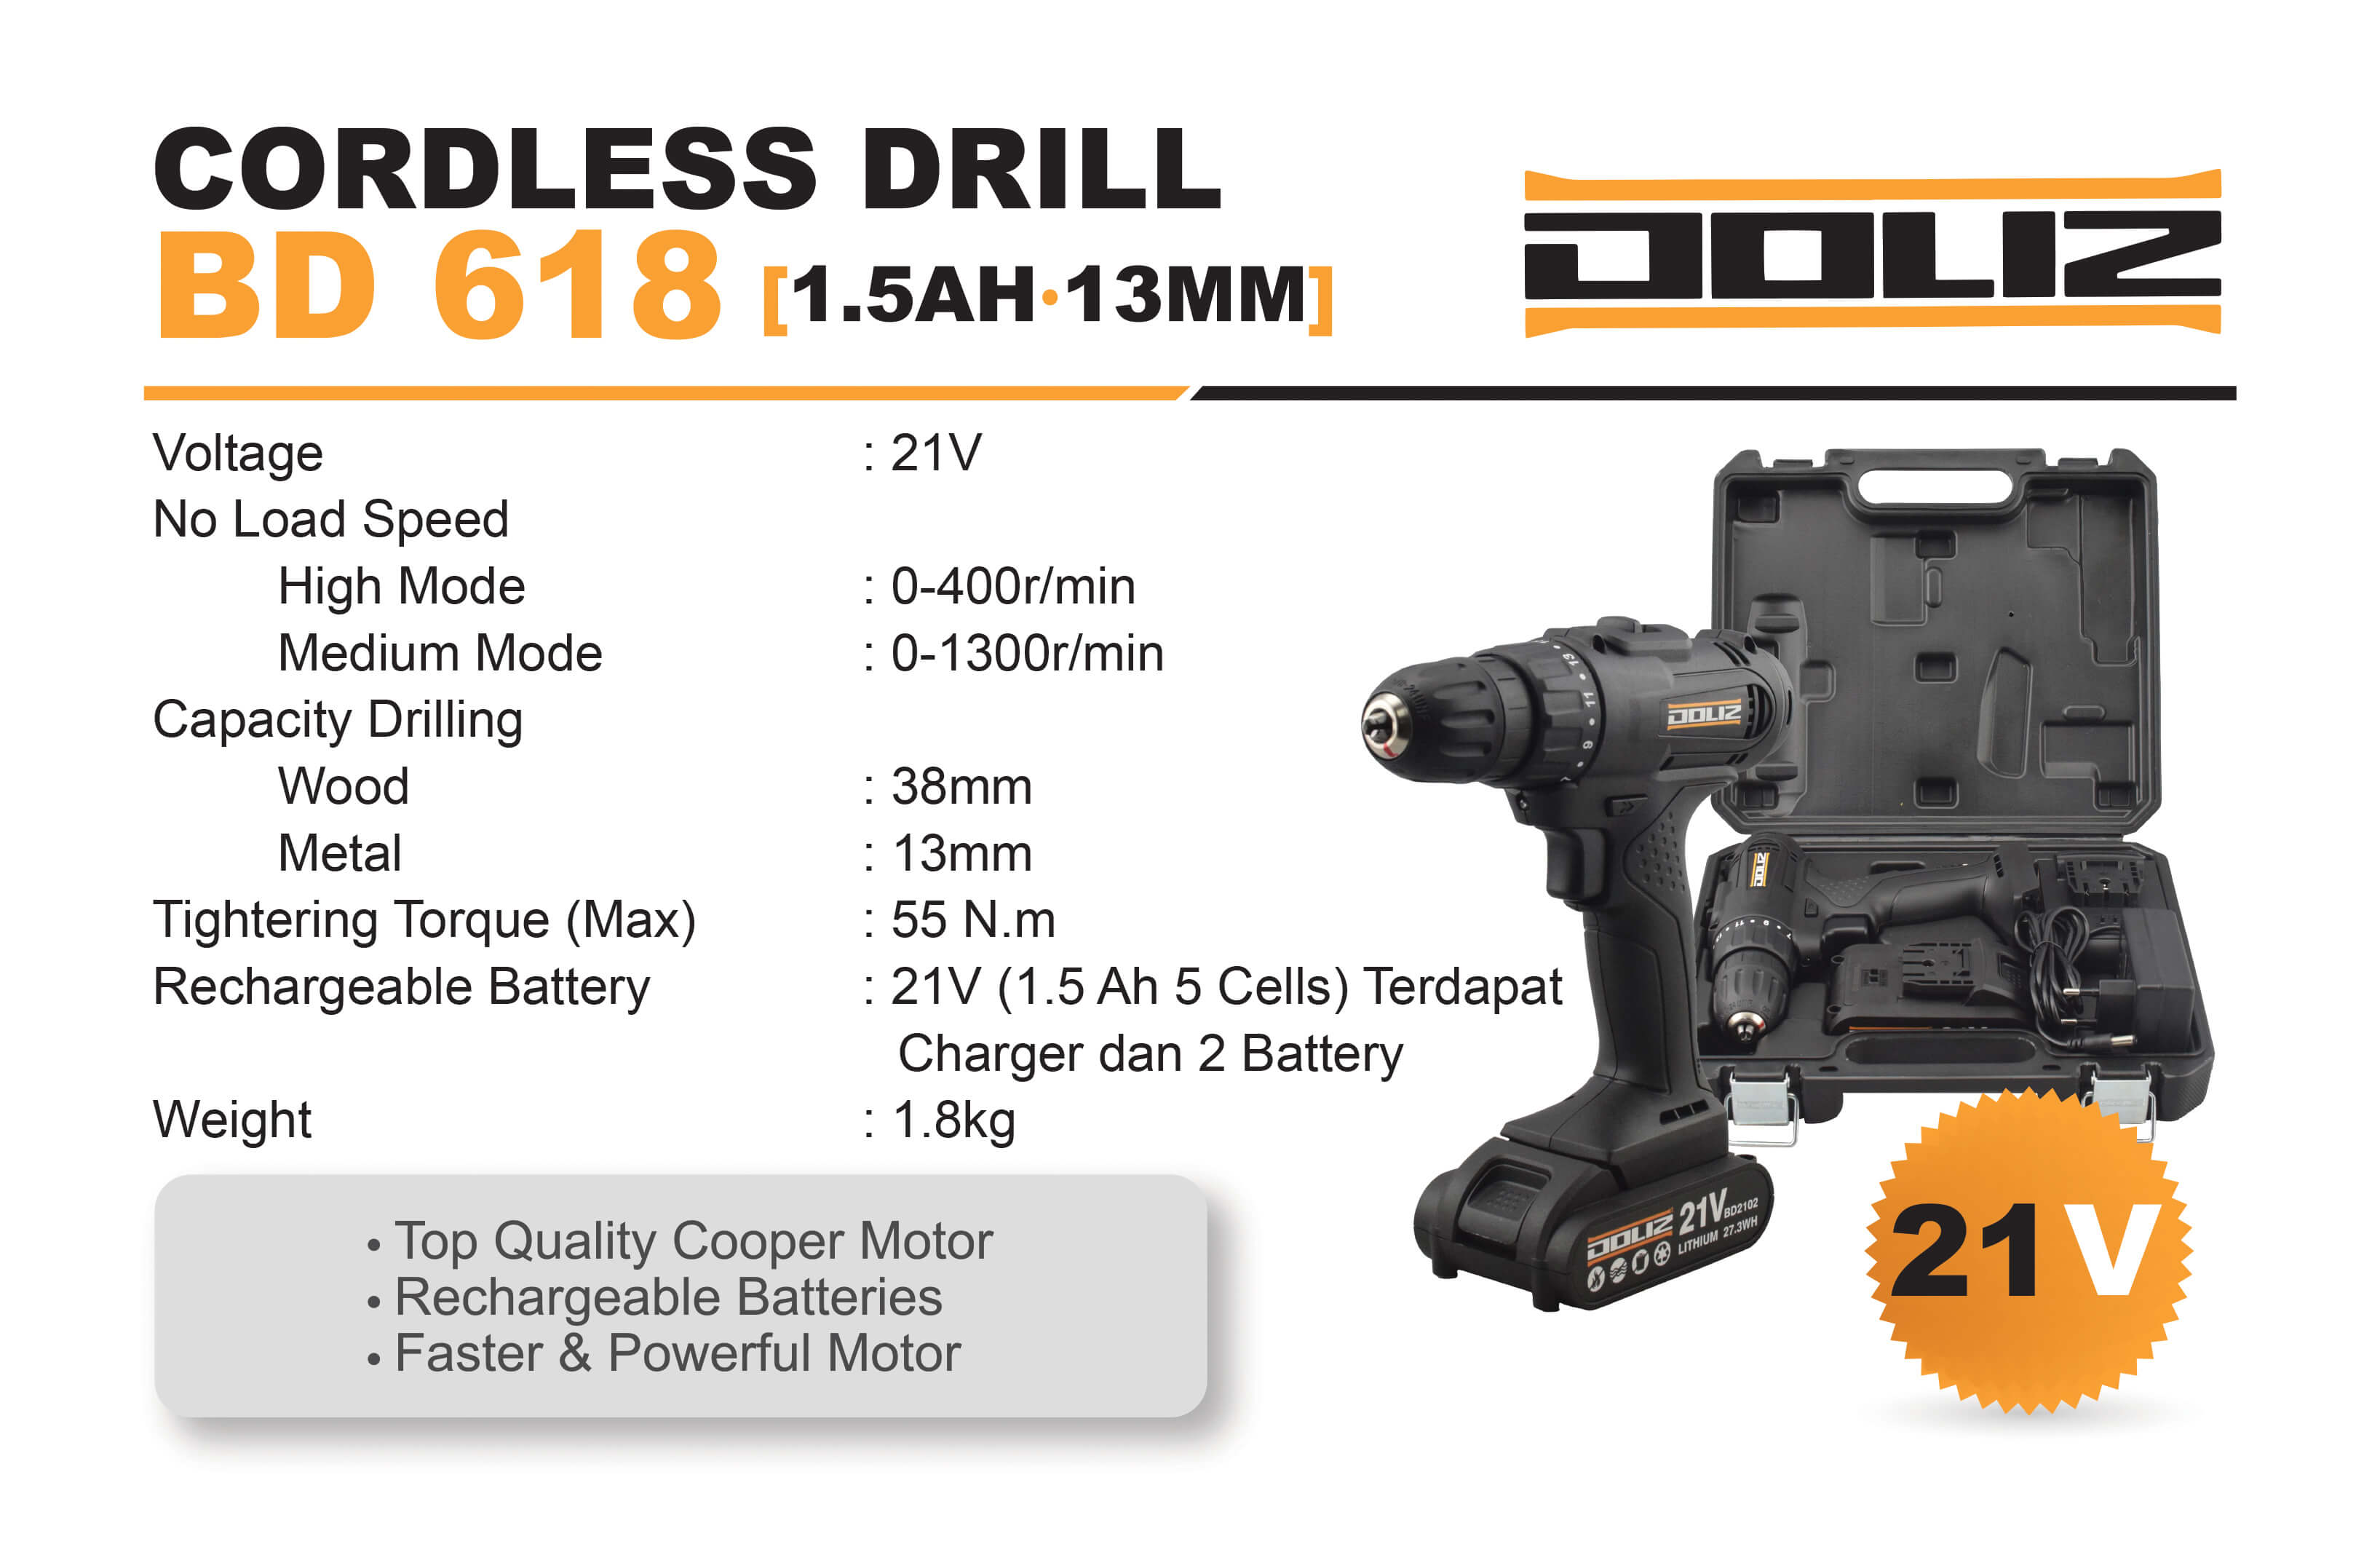 Doliz cordless drill series BD 618